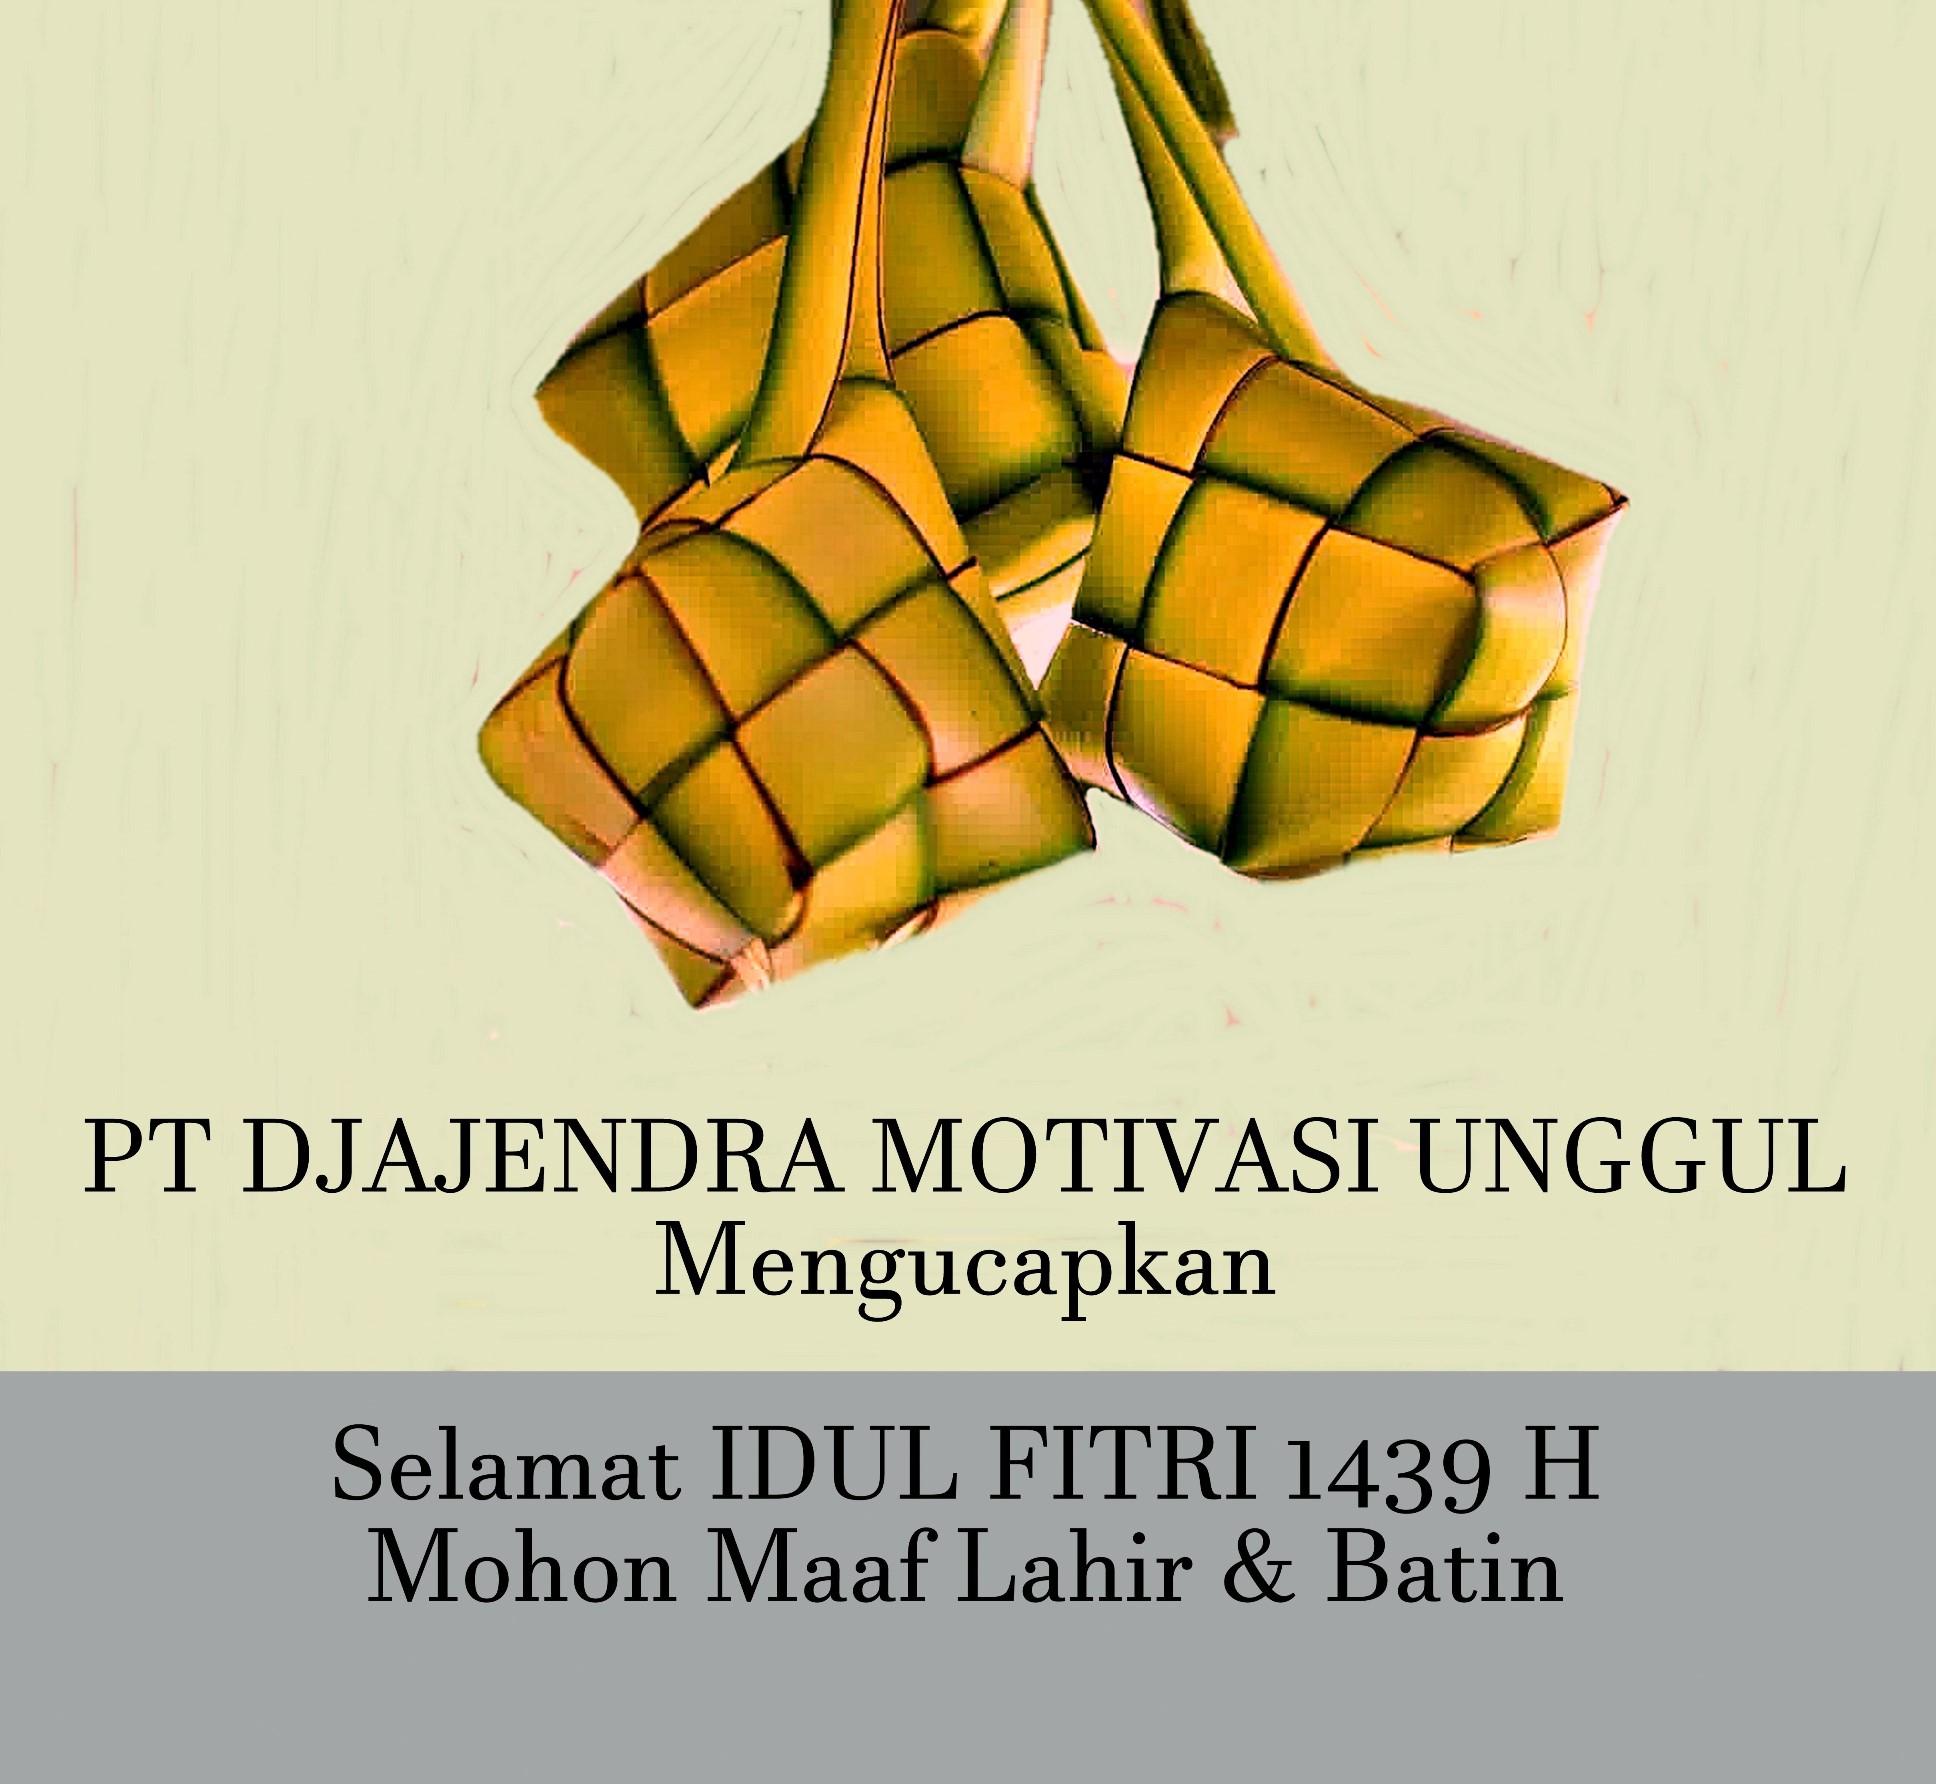 SELAMAT IDUL FITRI 1439 H / 2018